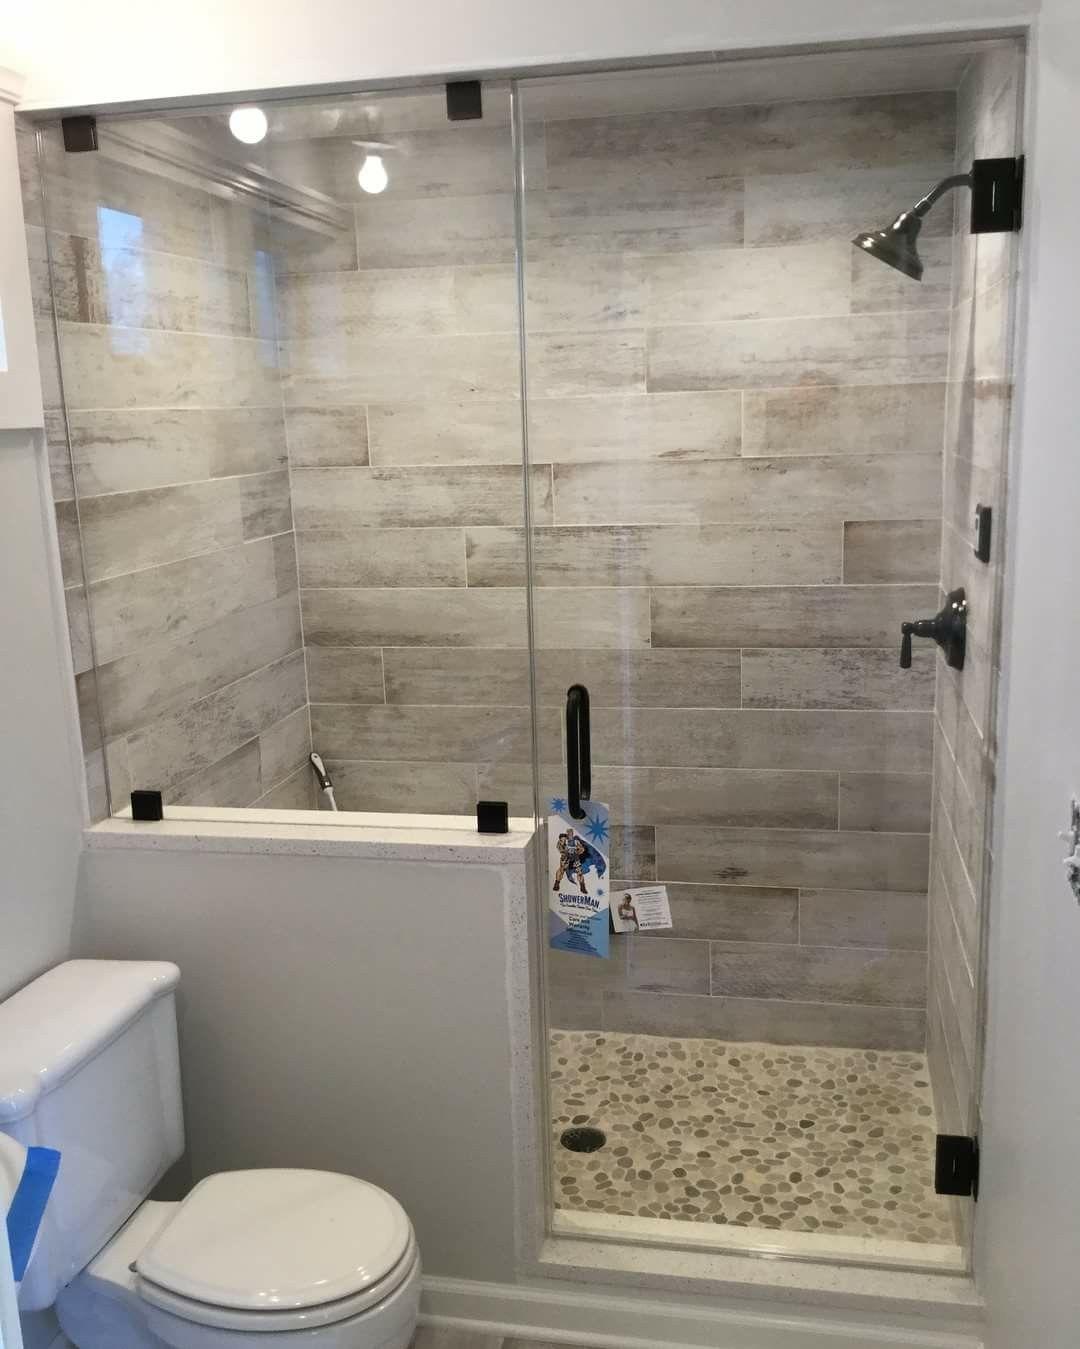 Simple Tile Shower Idee Salle De Bain Deco Salle De Bain Toilette Salle De Bains En Marbre Moderne